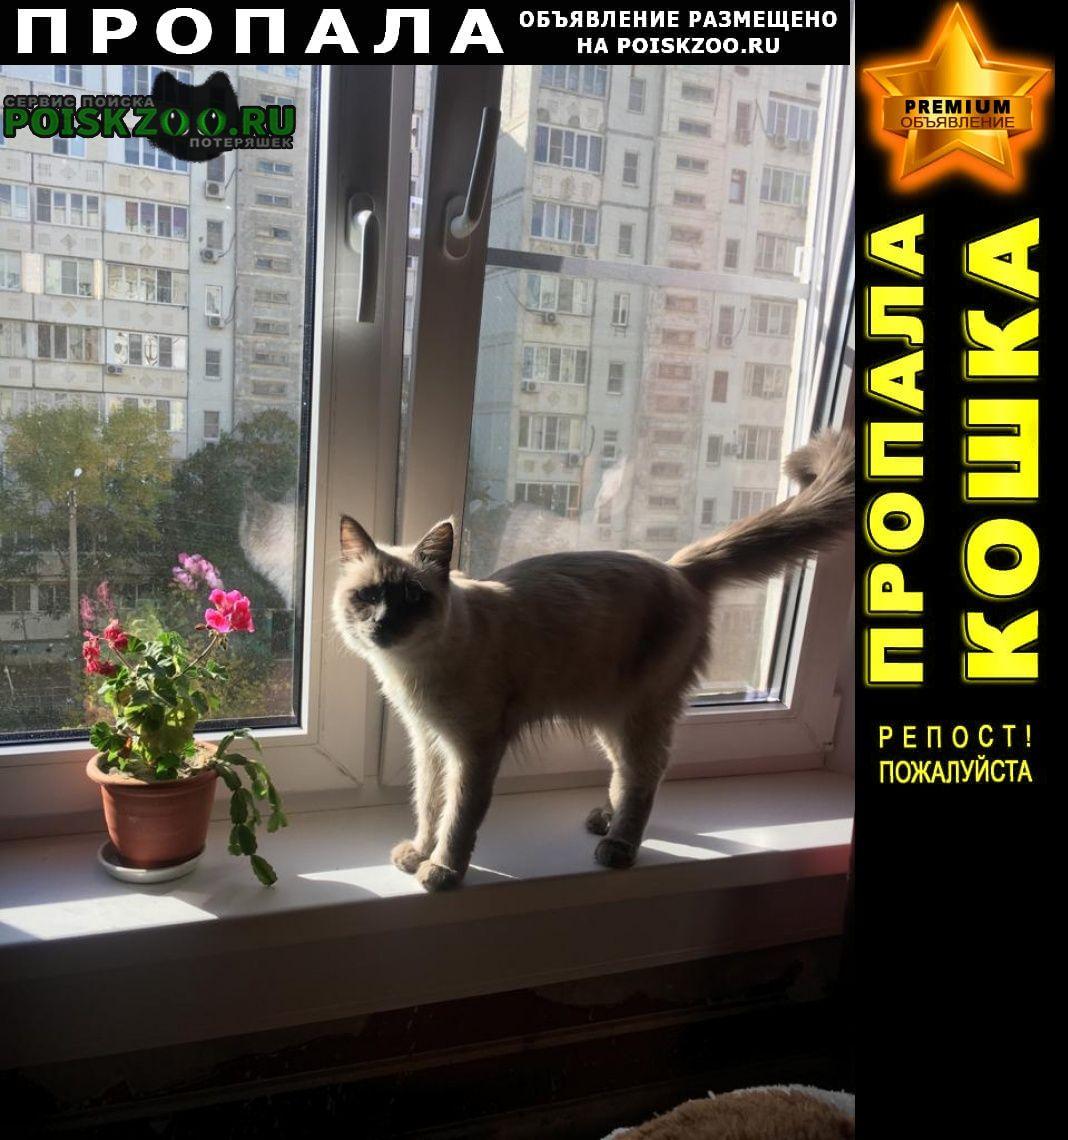 Пропал кот Астрахань